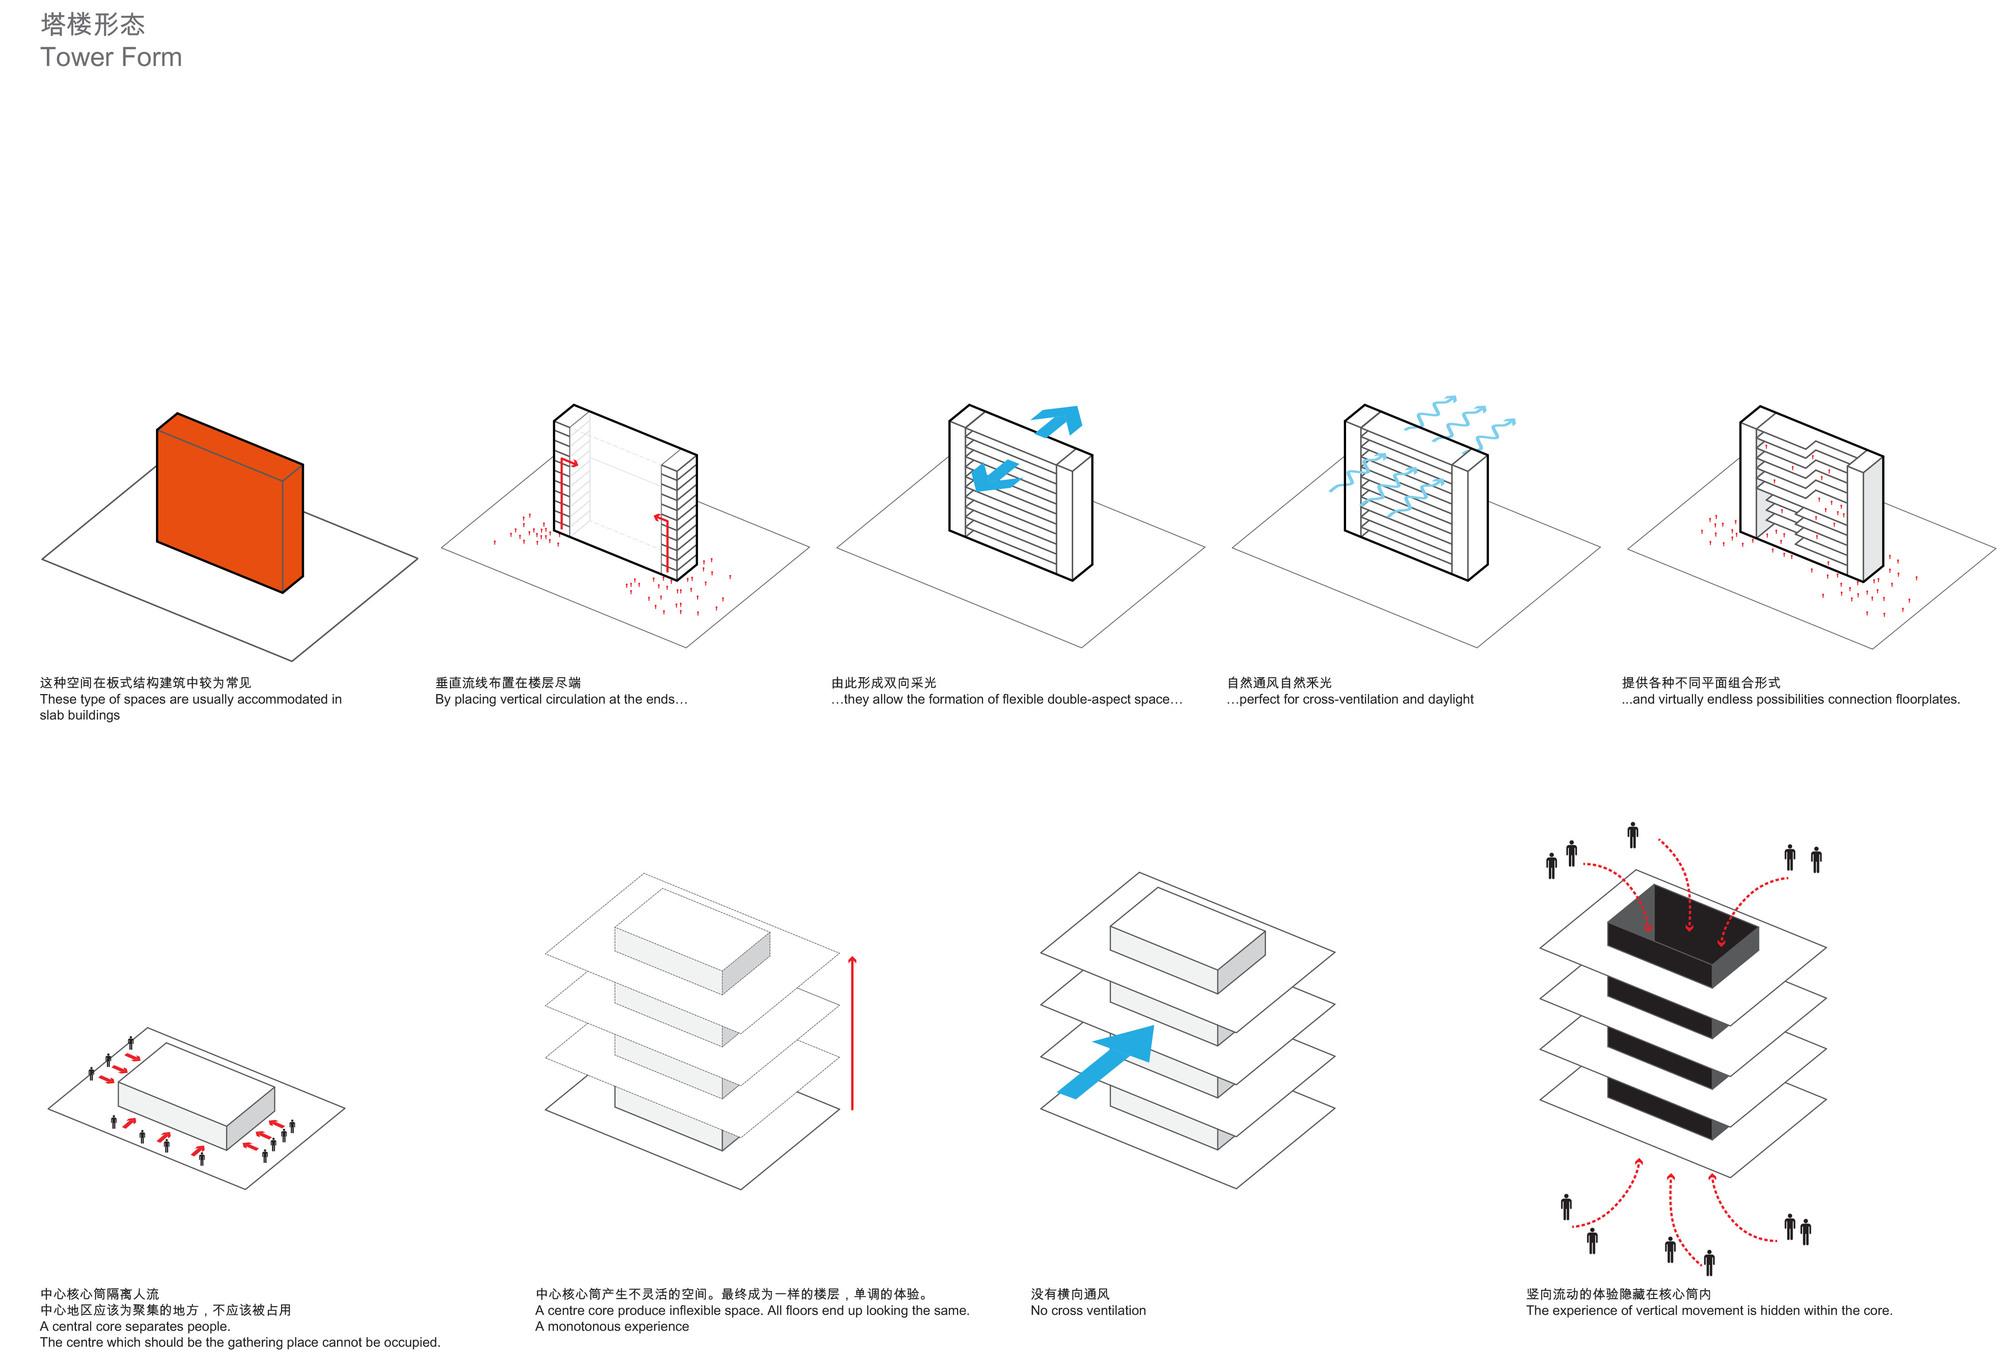 Galeria De Plp Divulga Planos De Construir O Edif 237 Cio Mais